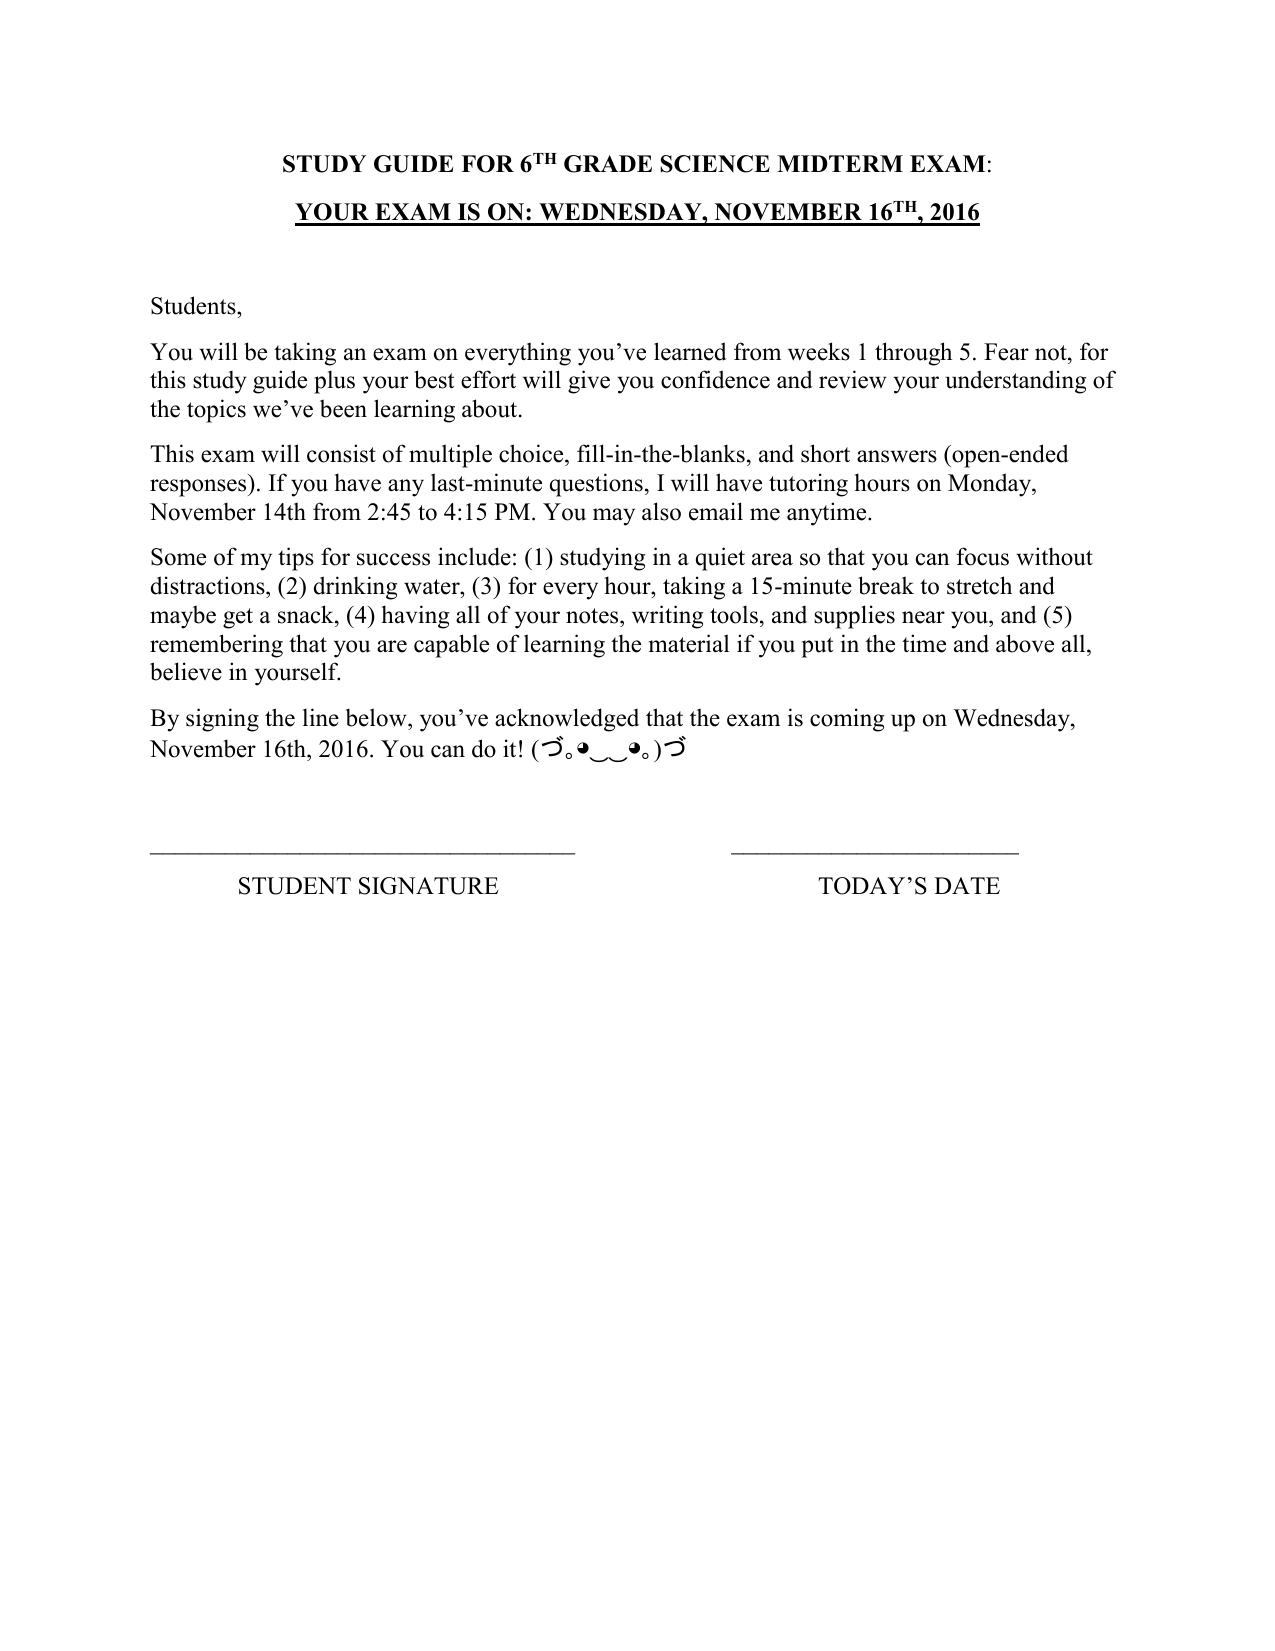 STUDY GUIDE FOR 6TH GRADE SCIENCE MIDTERM EXAM